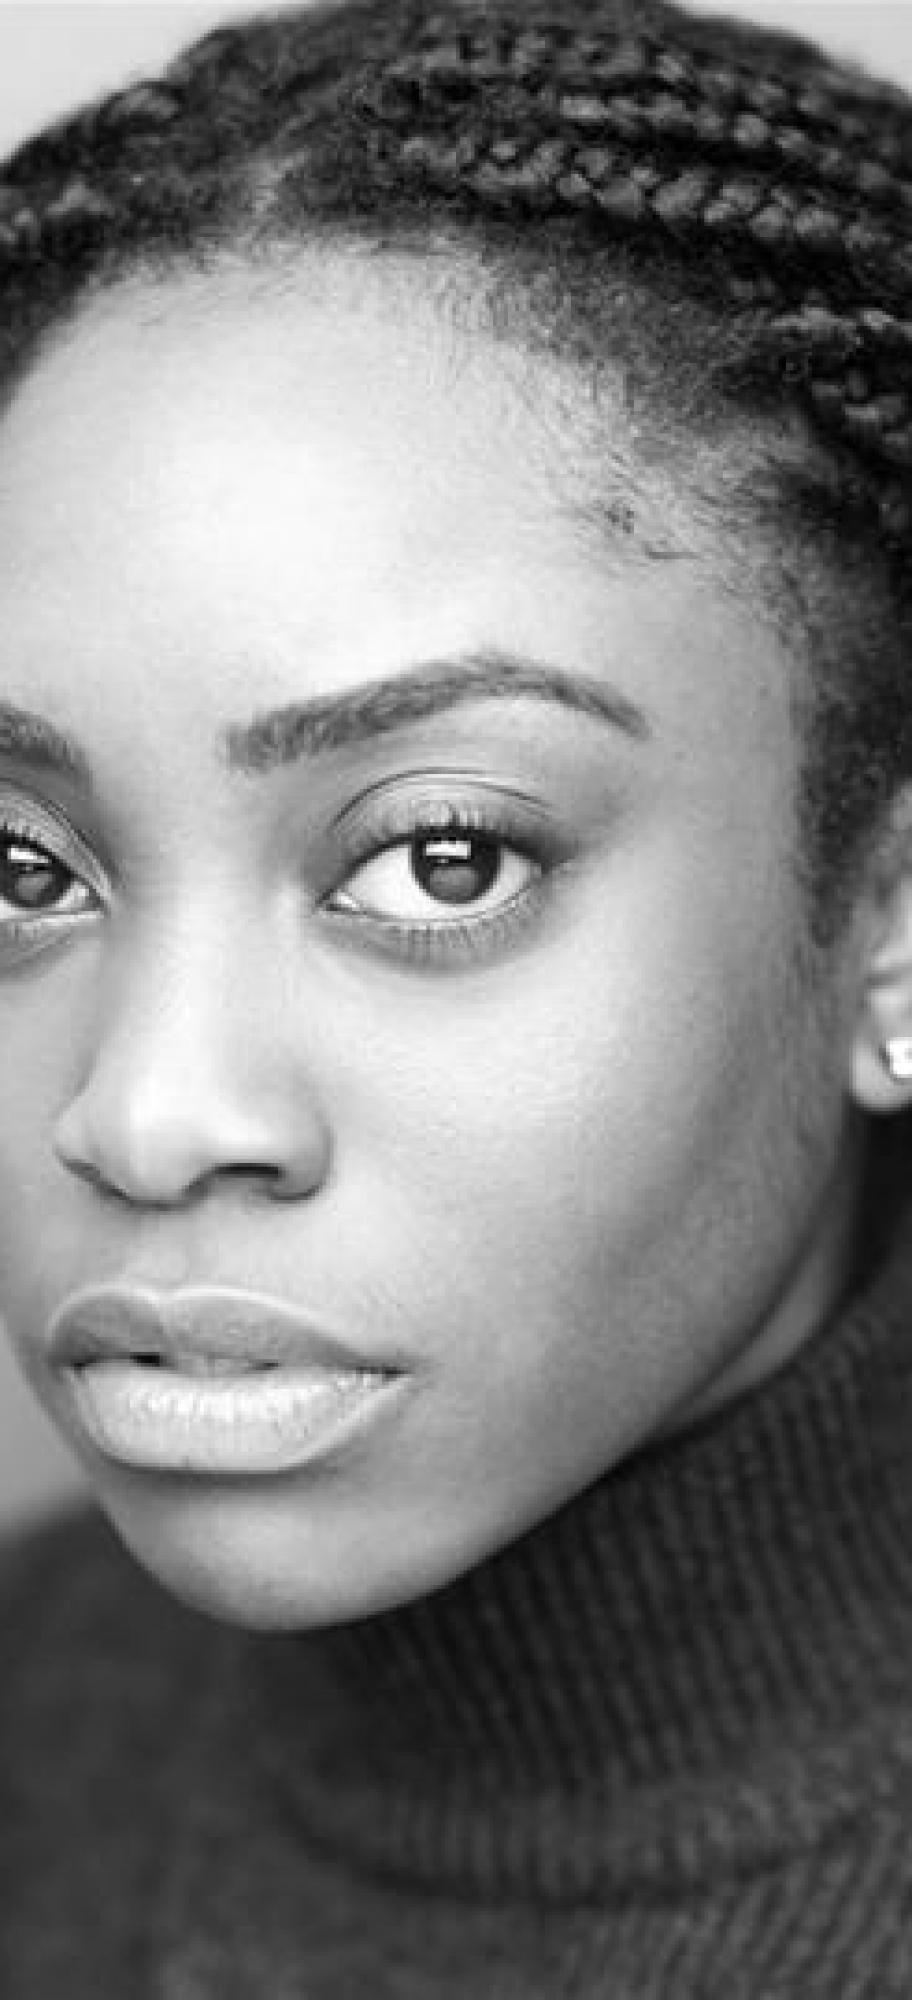 Anita-Joy Uwajeh